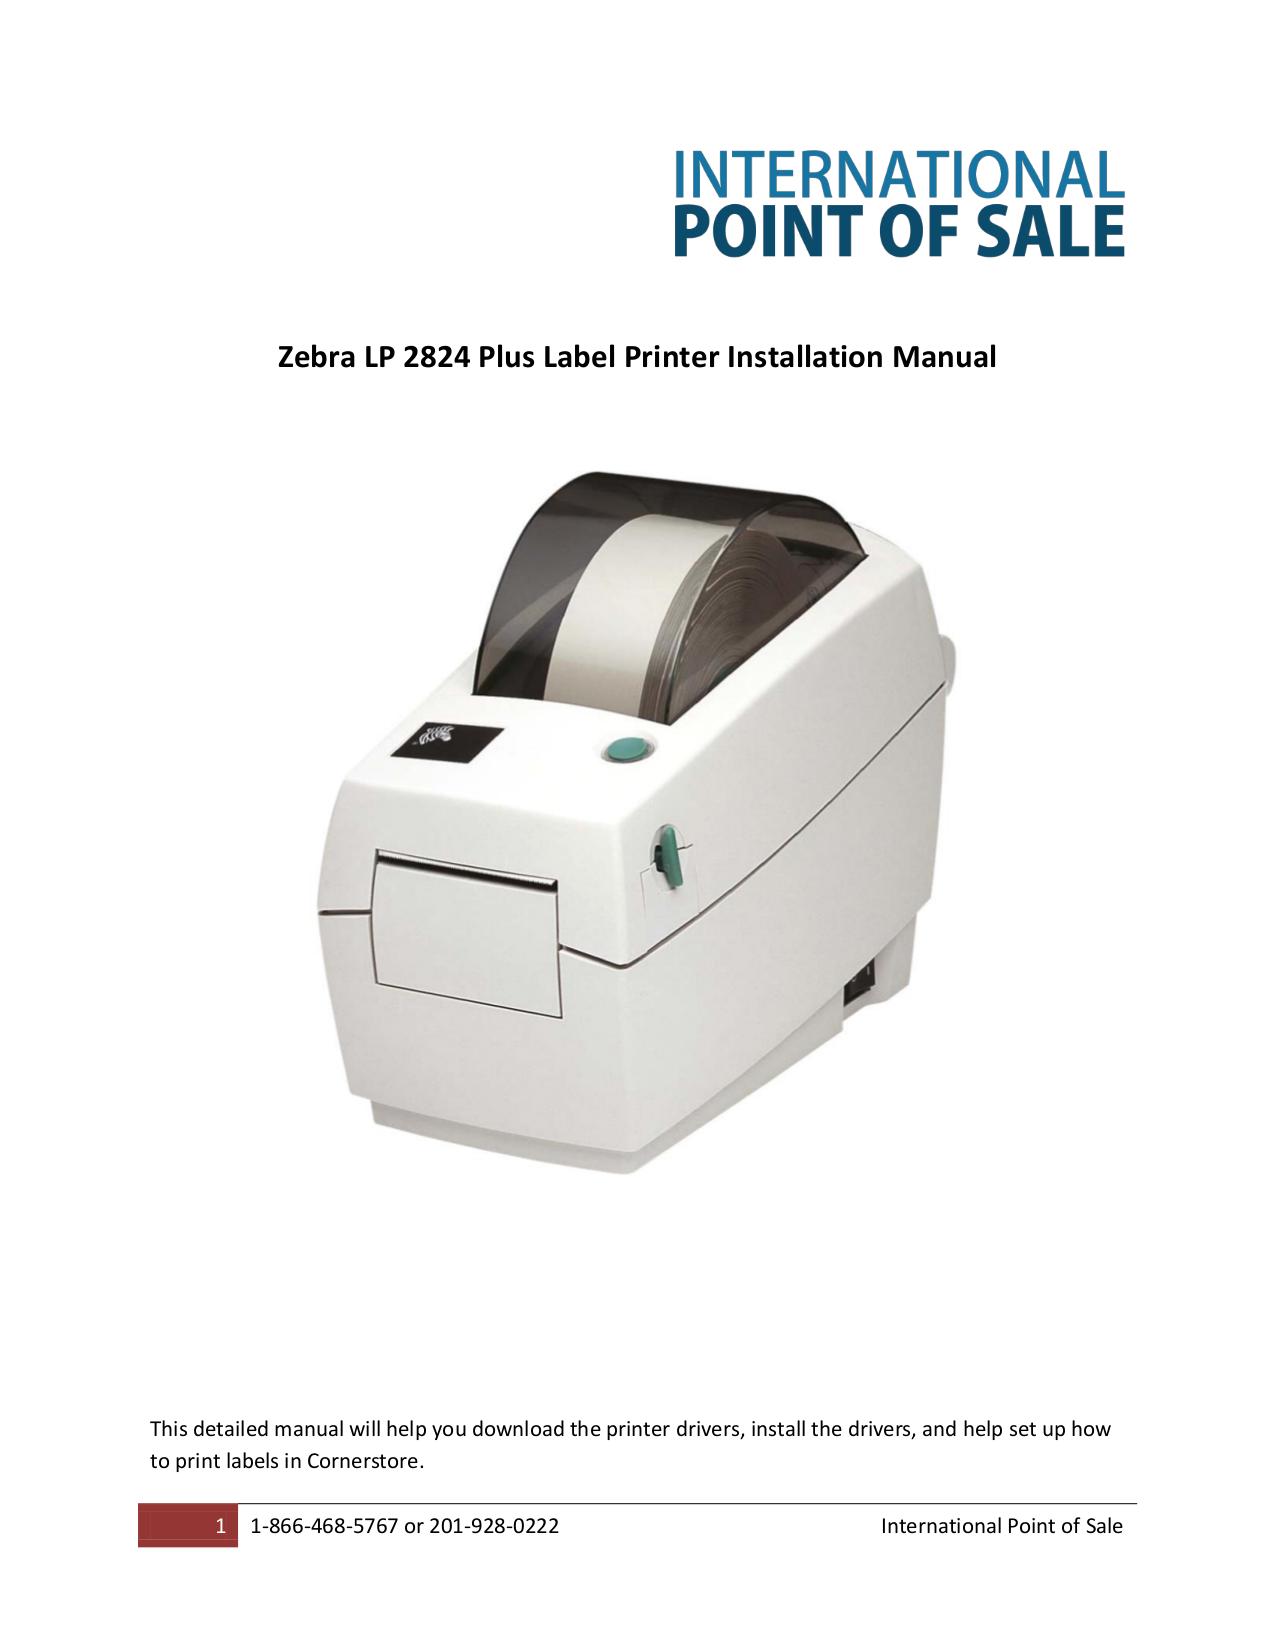 Download free pdf for Zebra TLP 2824 Plus Printer manual